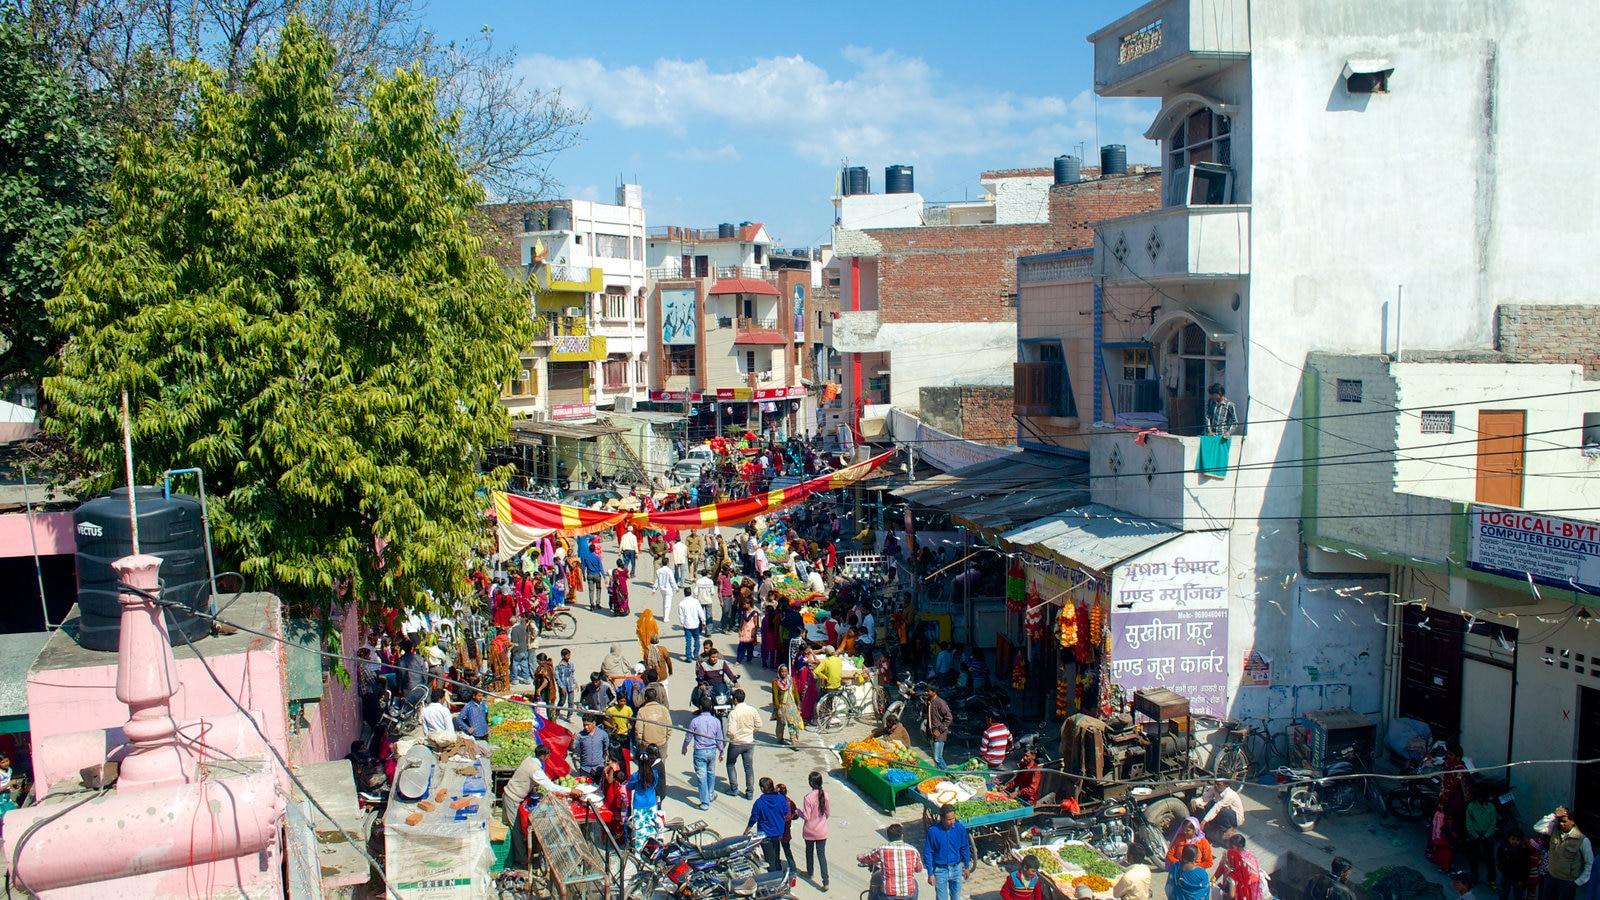 Hd wallpaper uttarakhand - Uttarakhand Which Includes Shopping A City And Markets